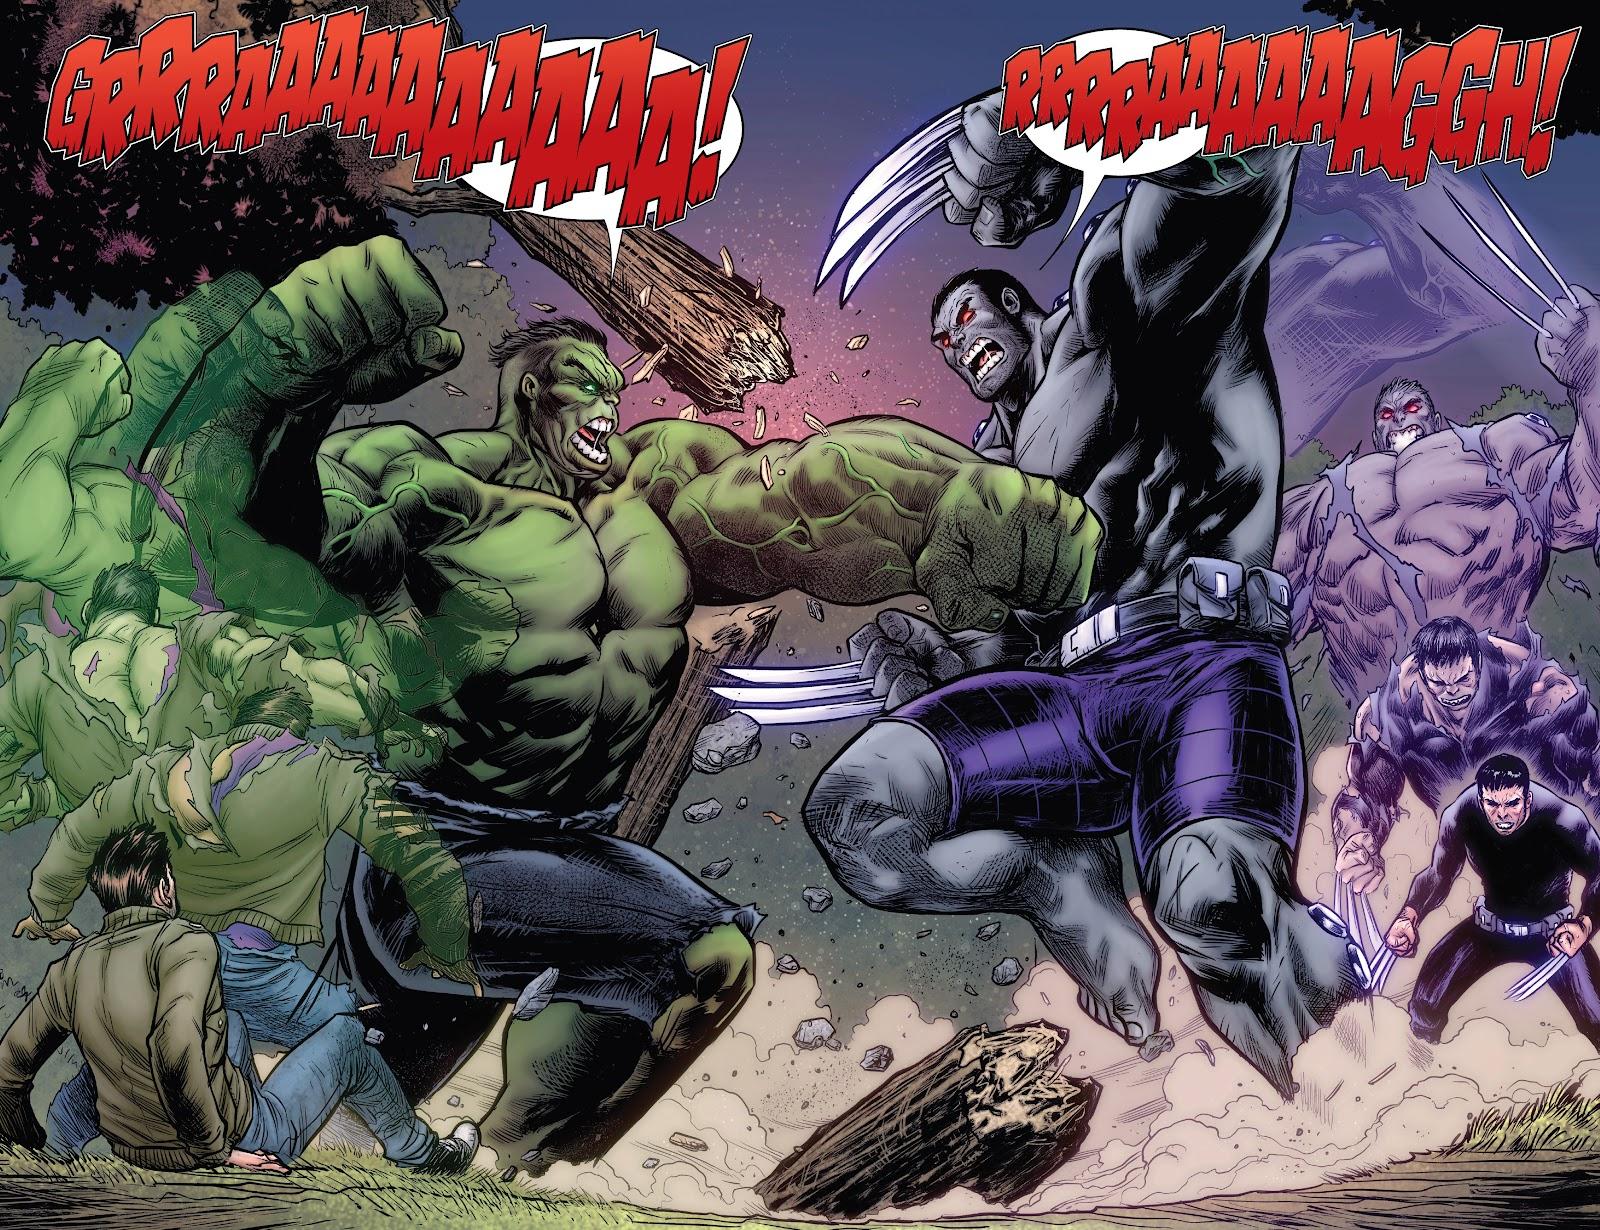 Read online Hulkverines comic -  Issue #1 - 18